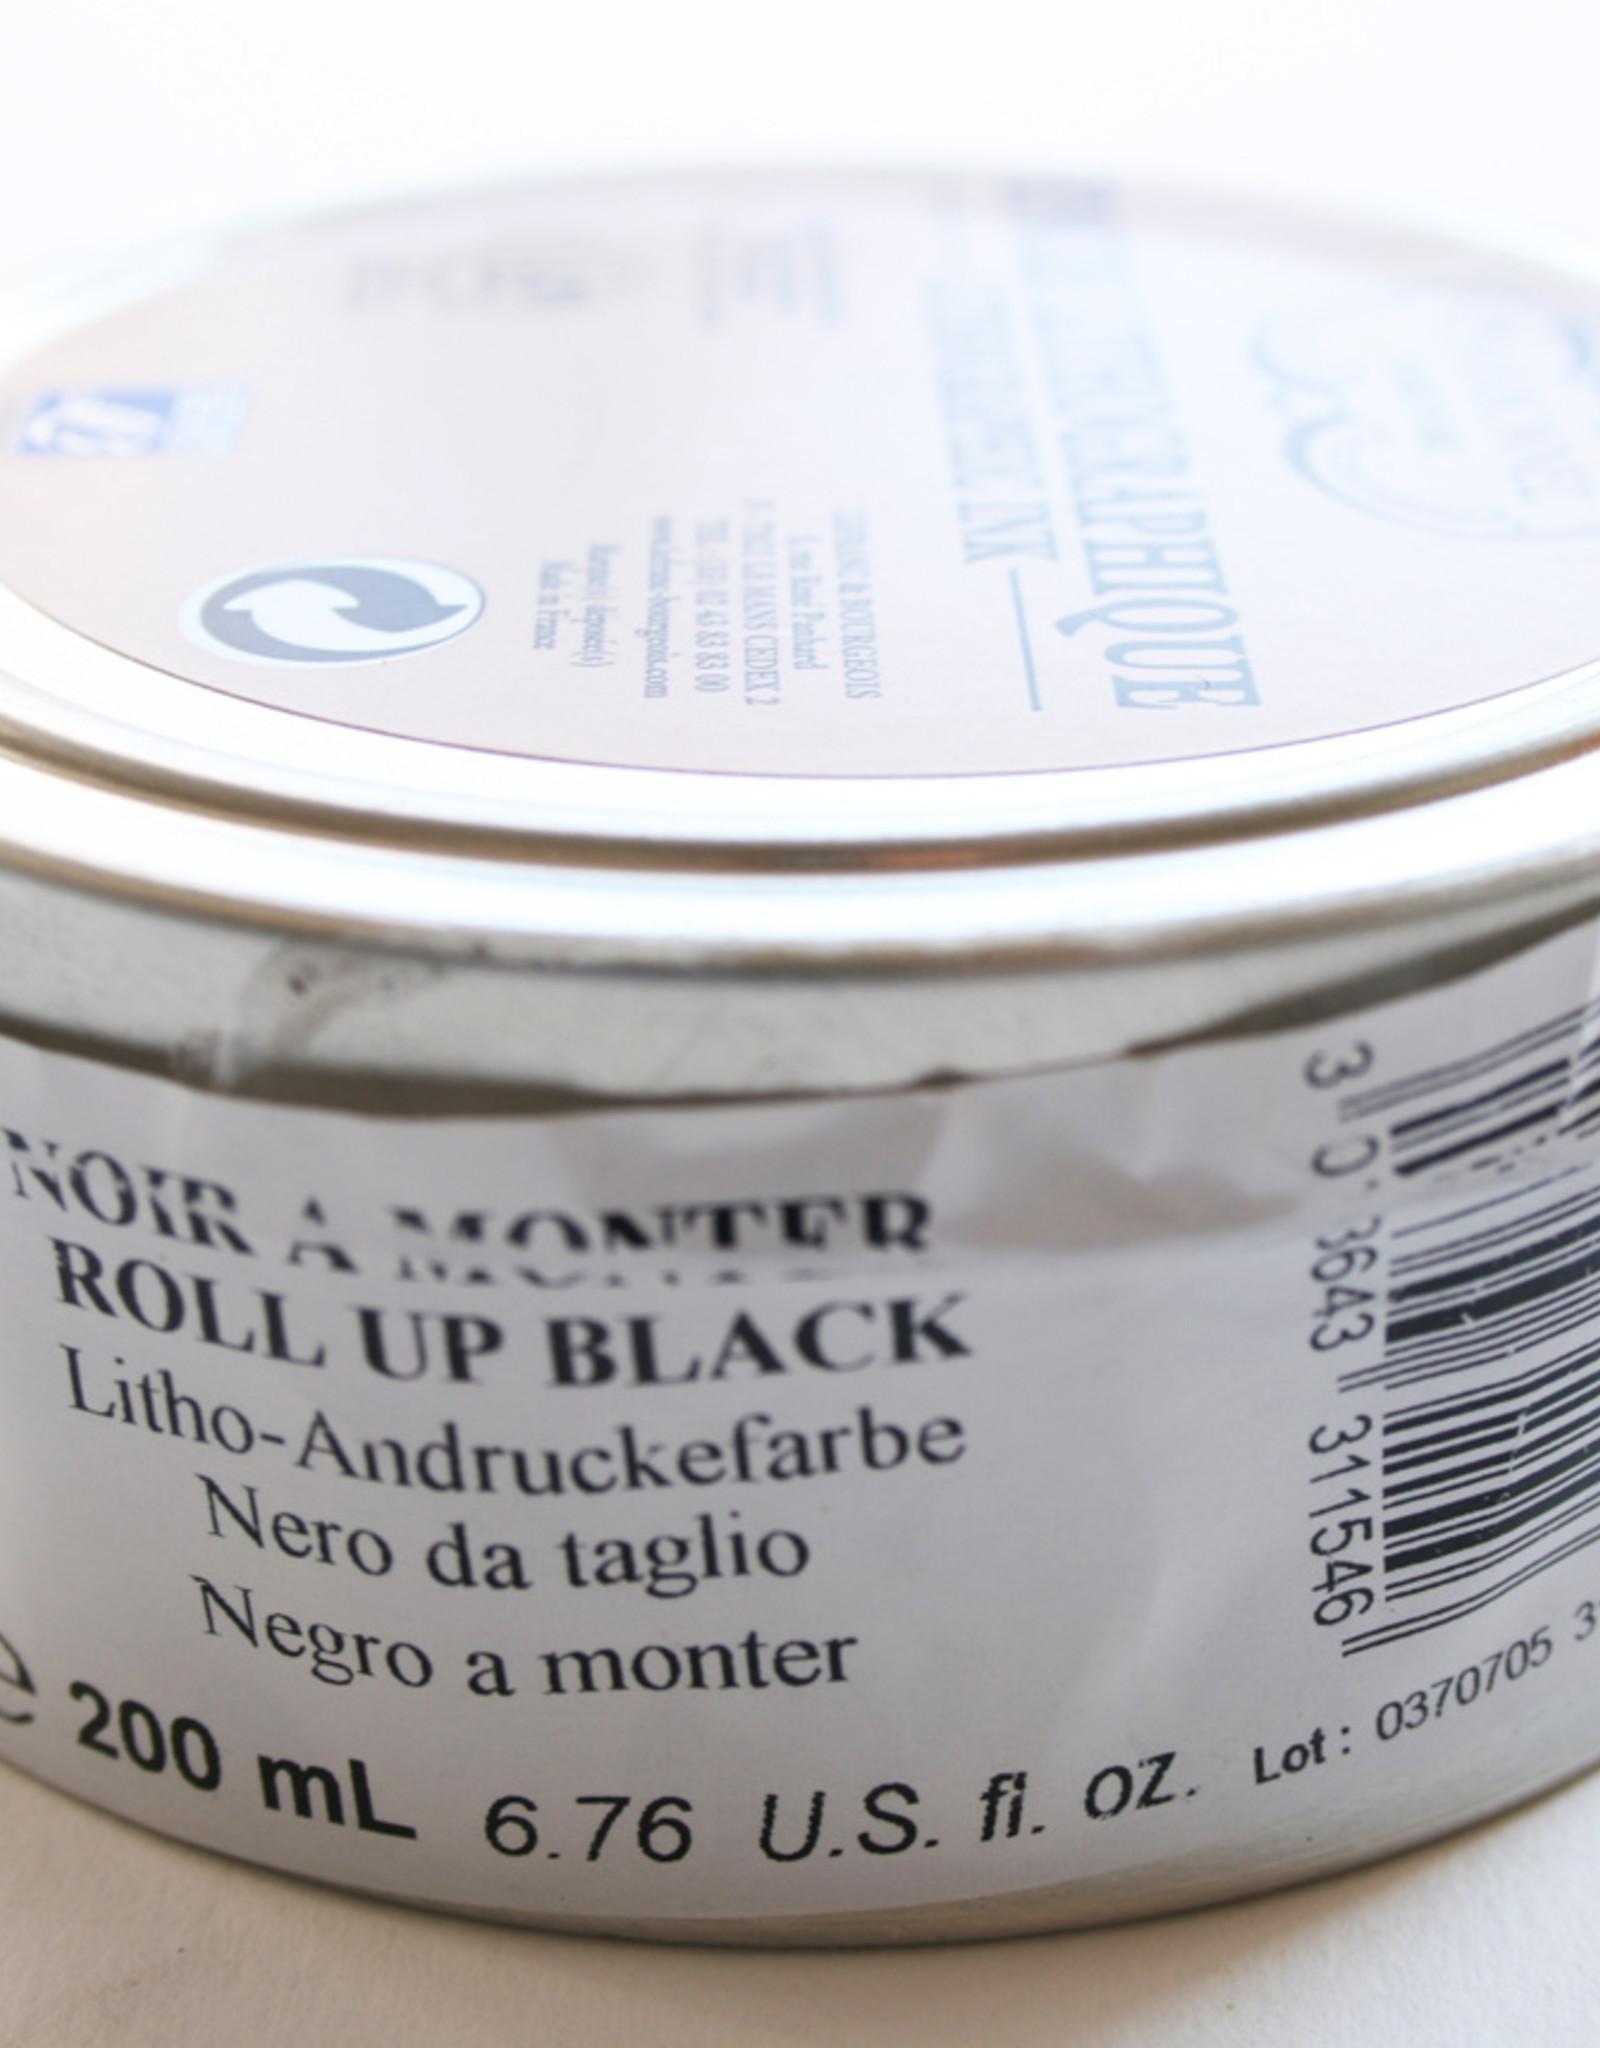 Litho Inkt Zwart Roll Up  (311546) 200 ml Lefranc & Bourgeois / Charbonnel